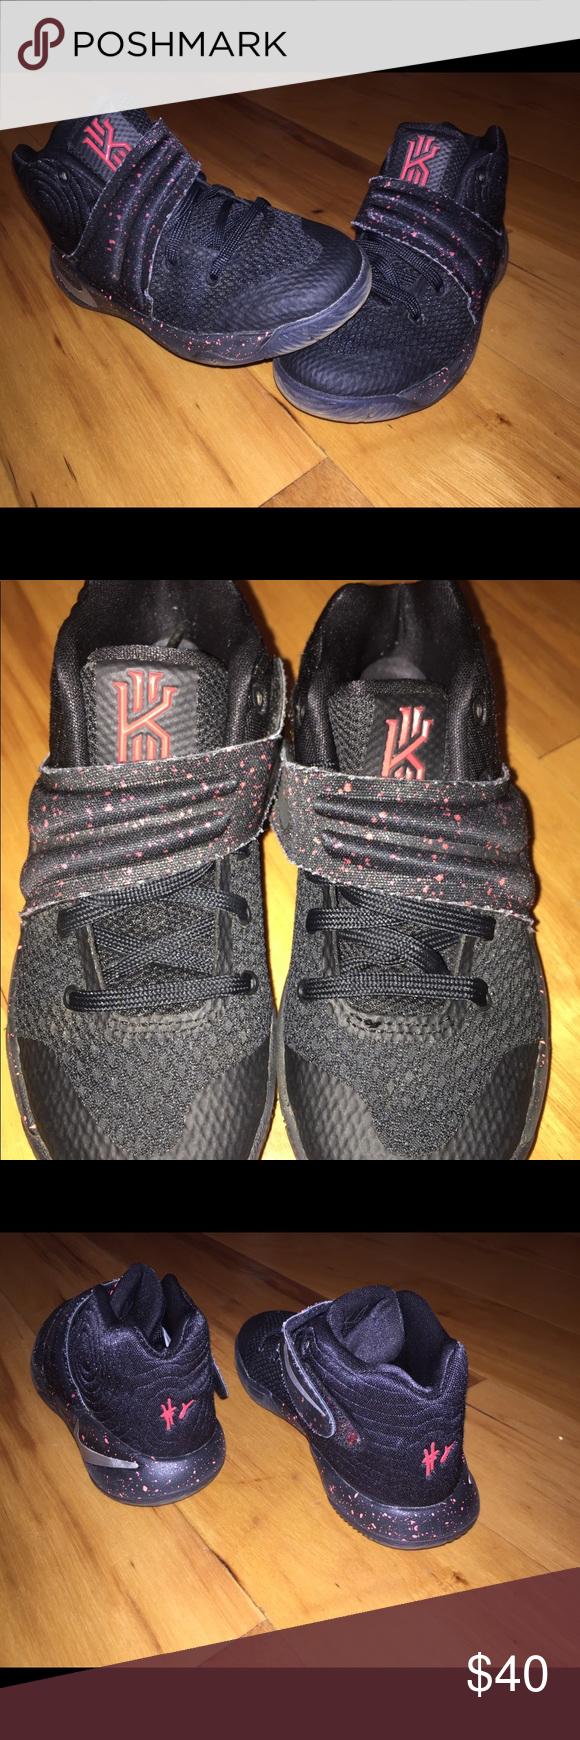 finest selection a0085 9aa54 Boys Nike Kyrie 2 PreSchool Basketball Shoe Sz 11C Nike ...